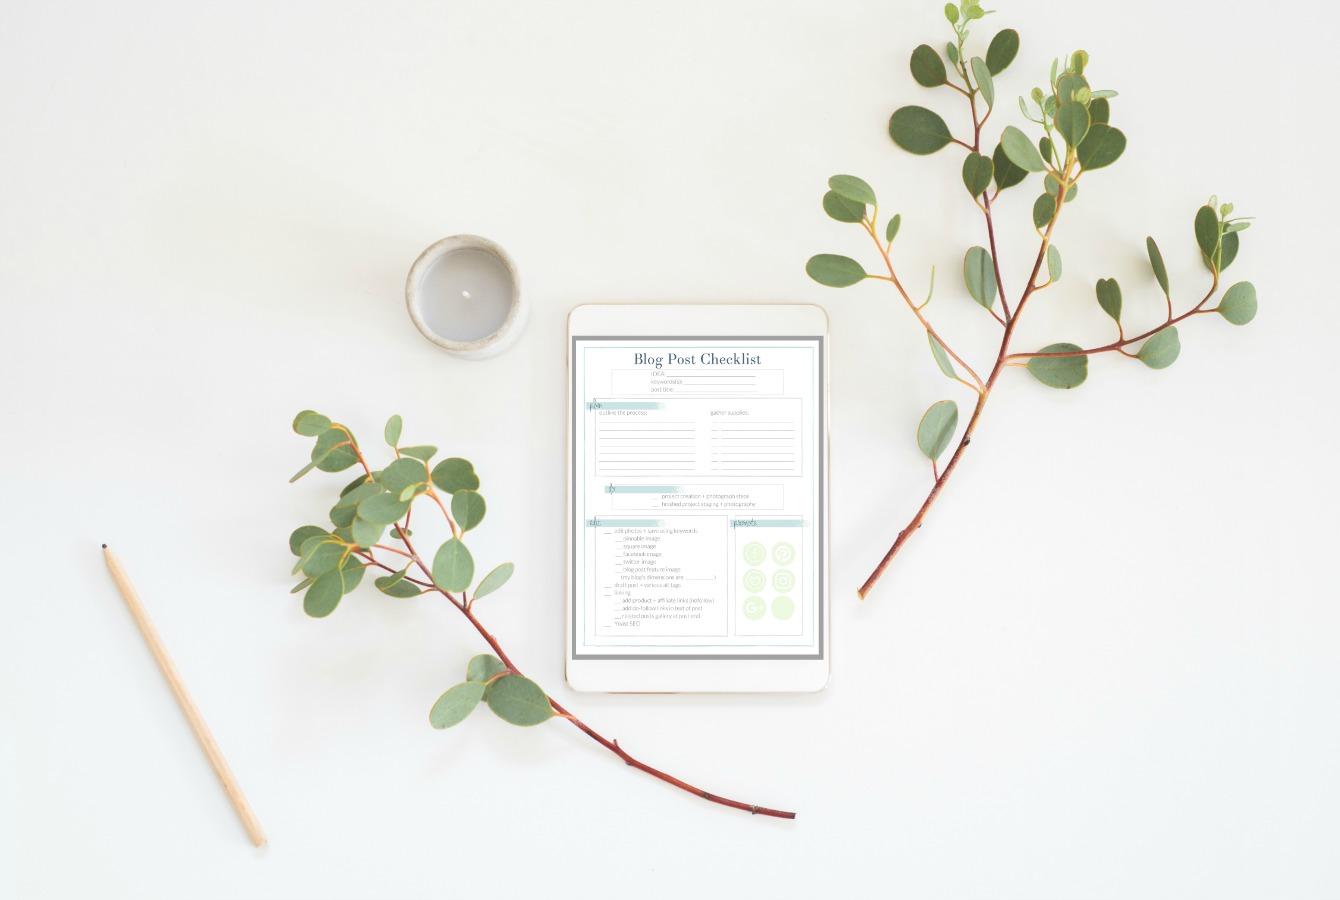 Blog Post Checklist - a free printable